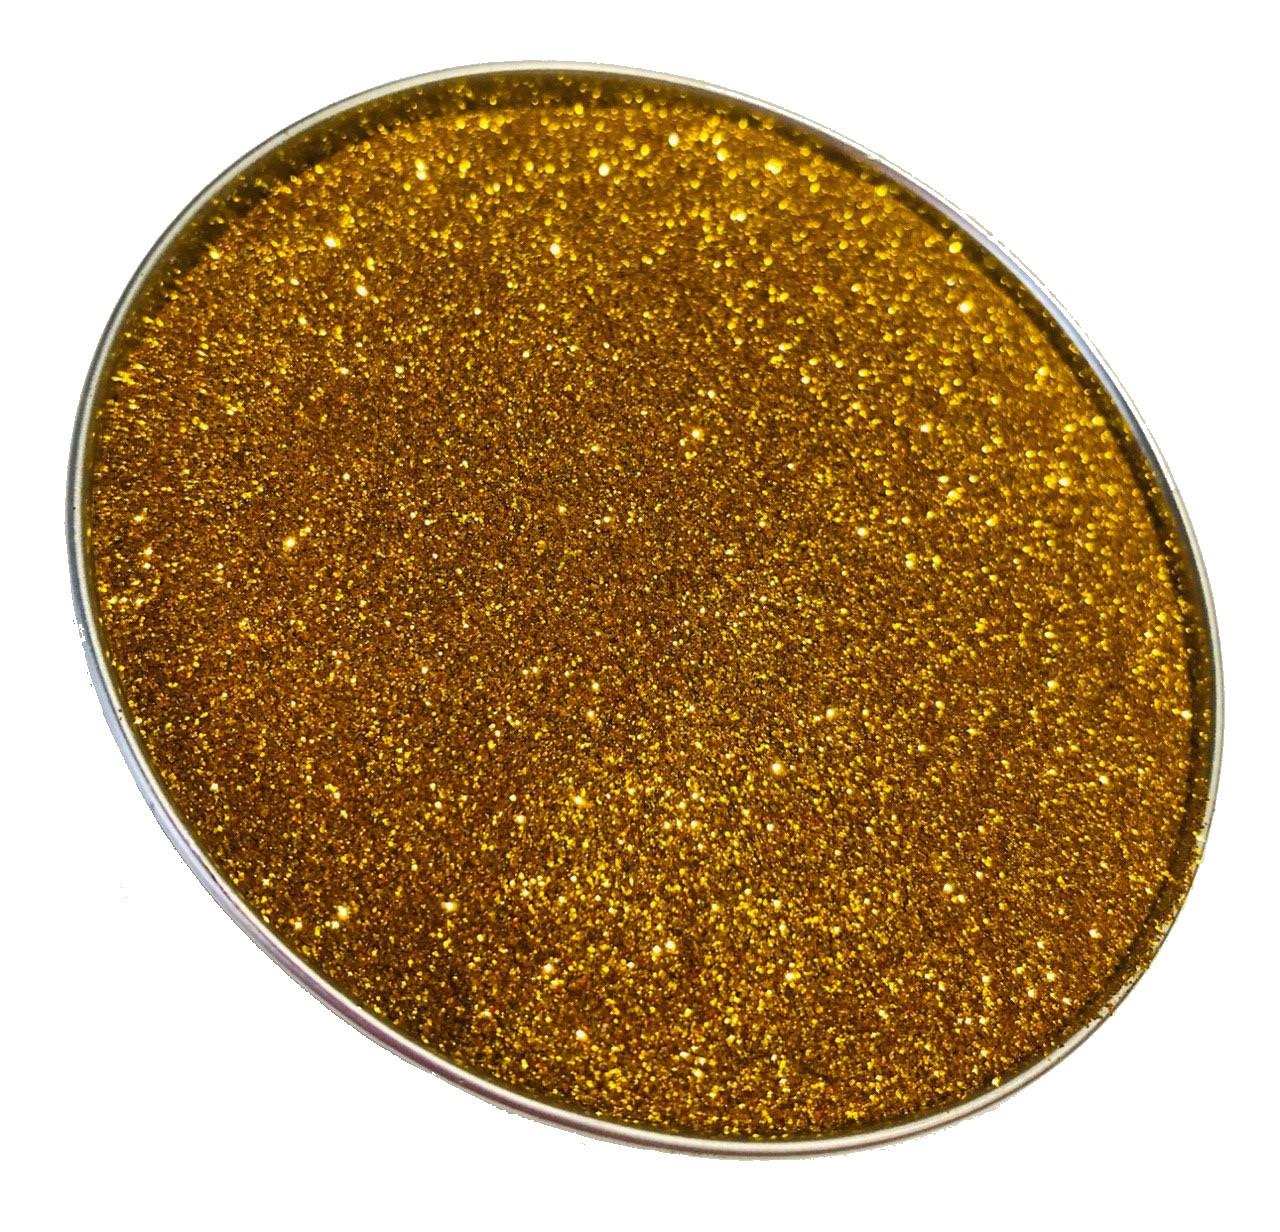 Глиттер желтое золото TS103-128, 150мл